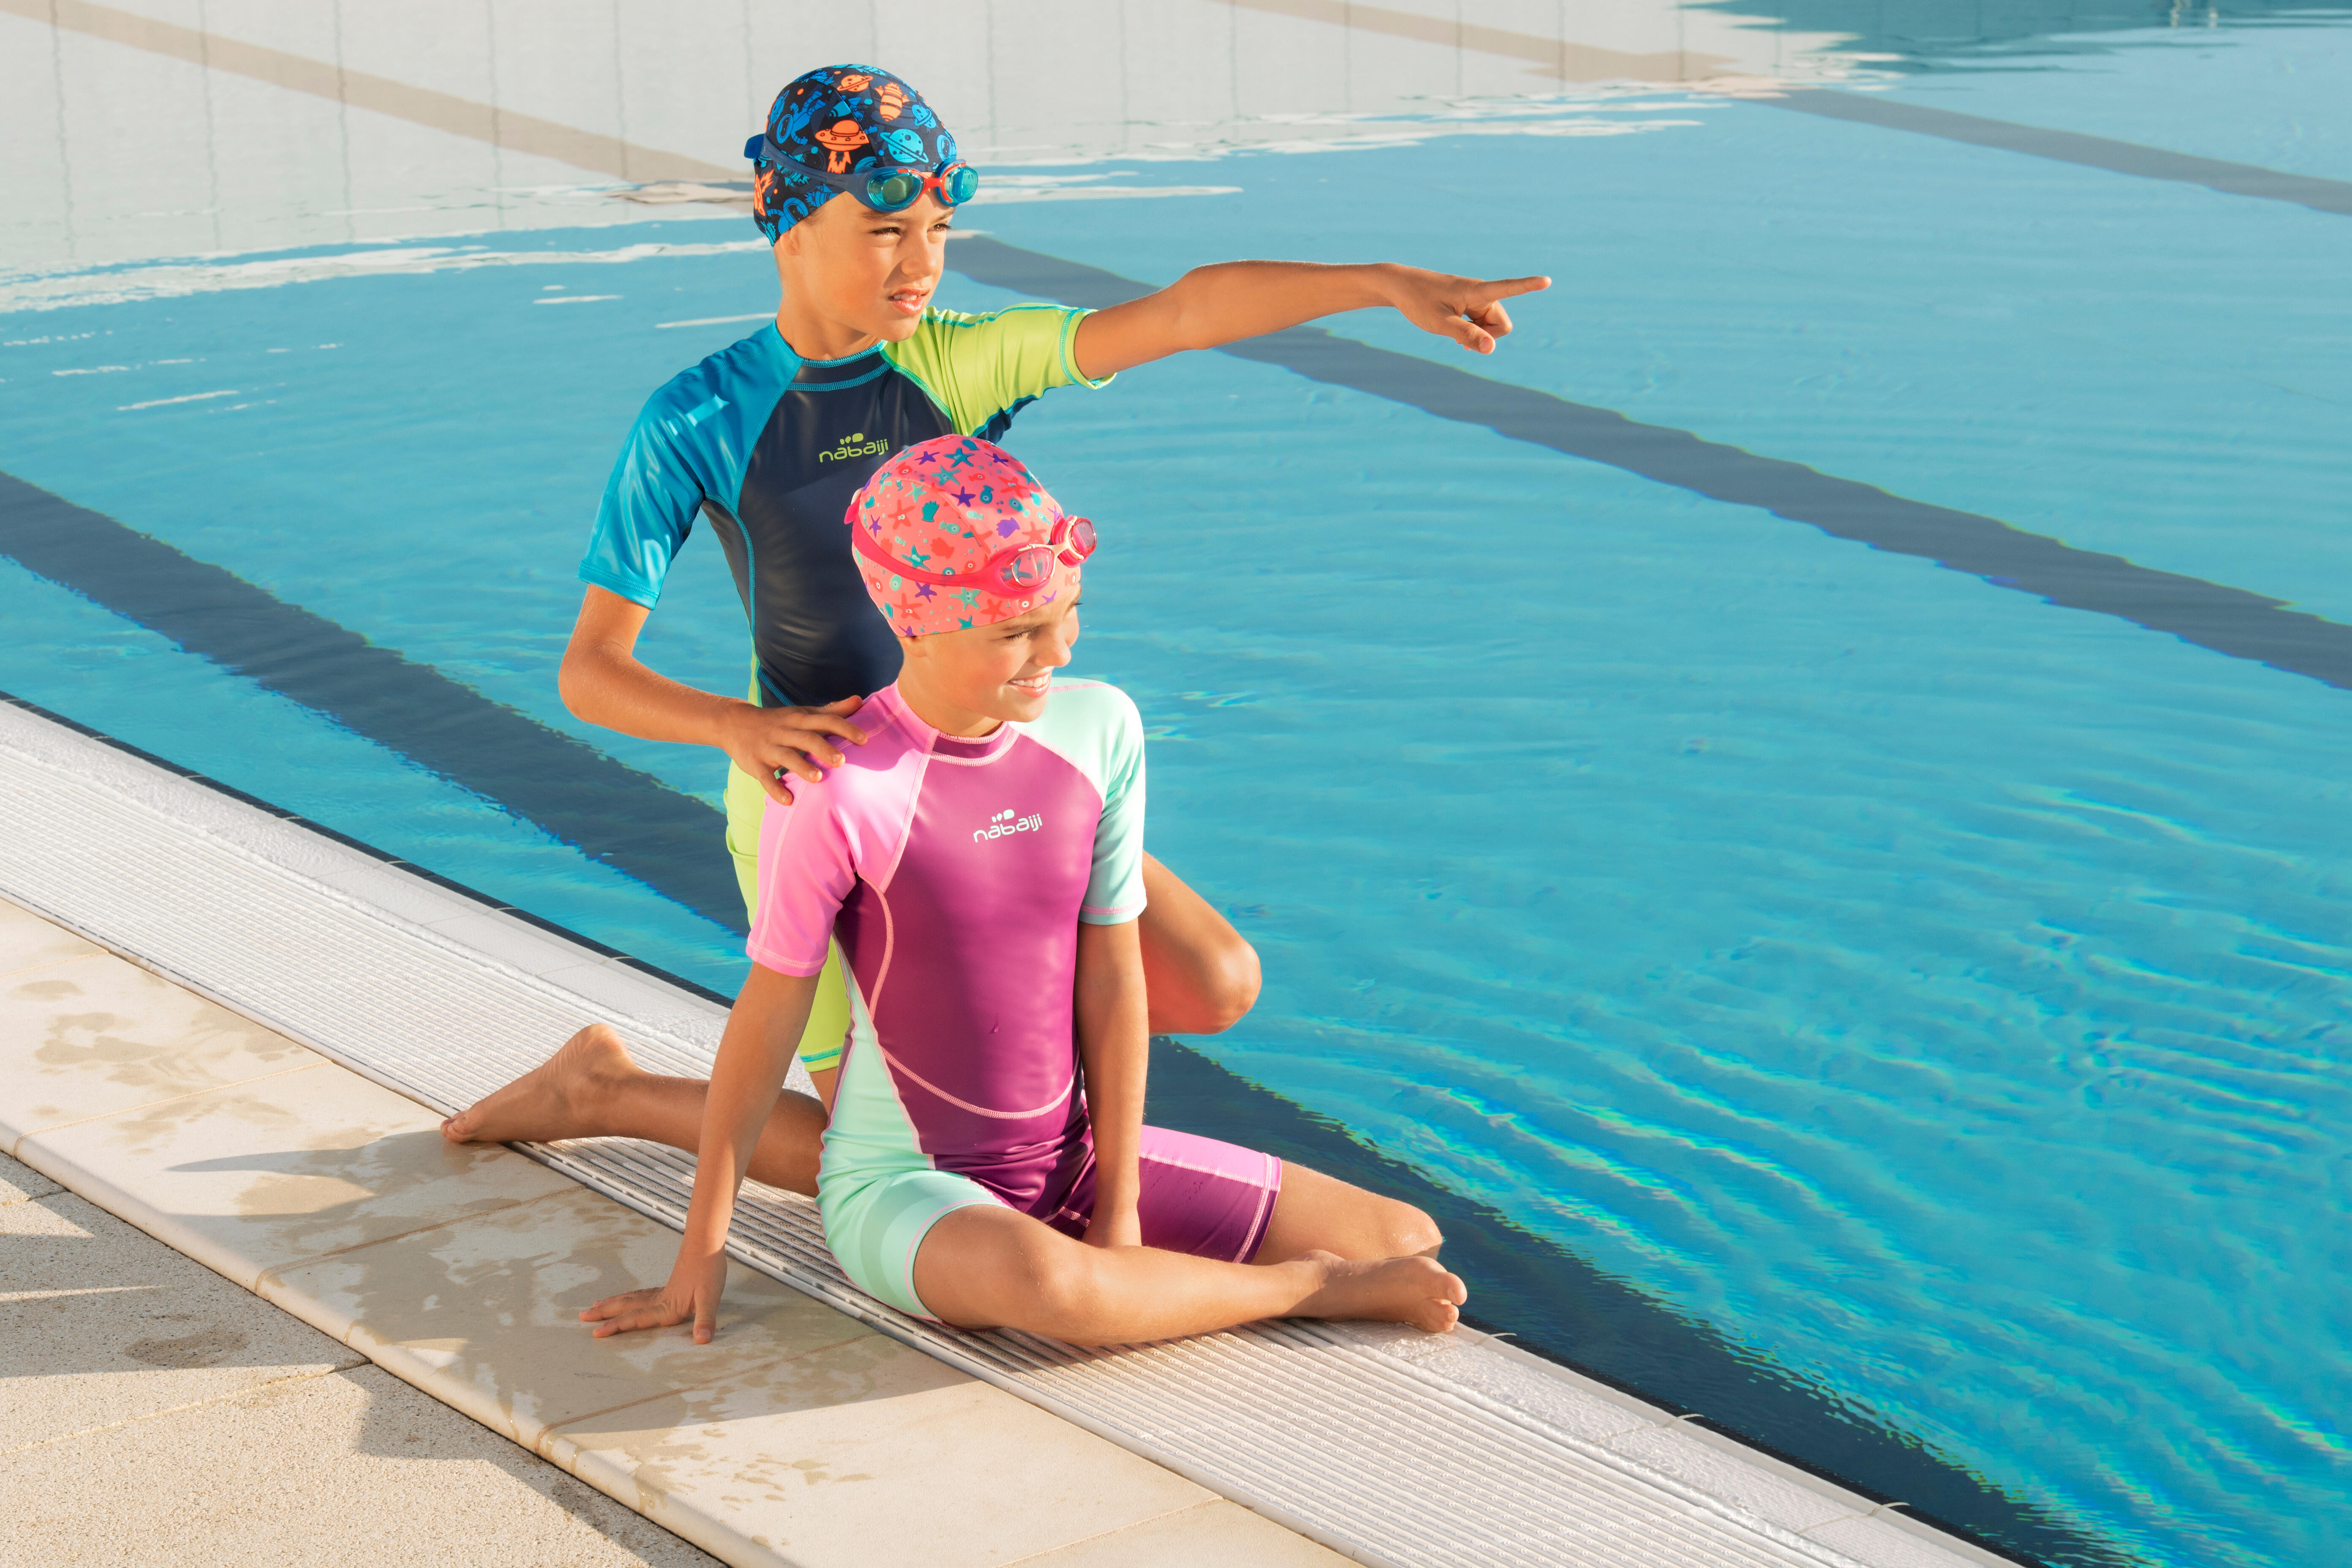 Girl swimming costume kloupi- purple pink